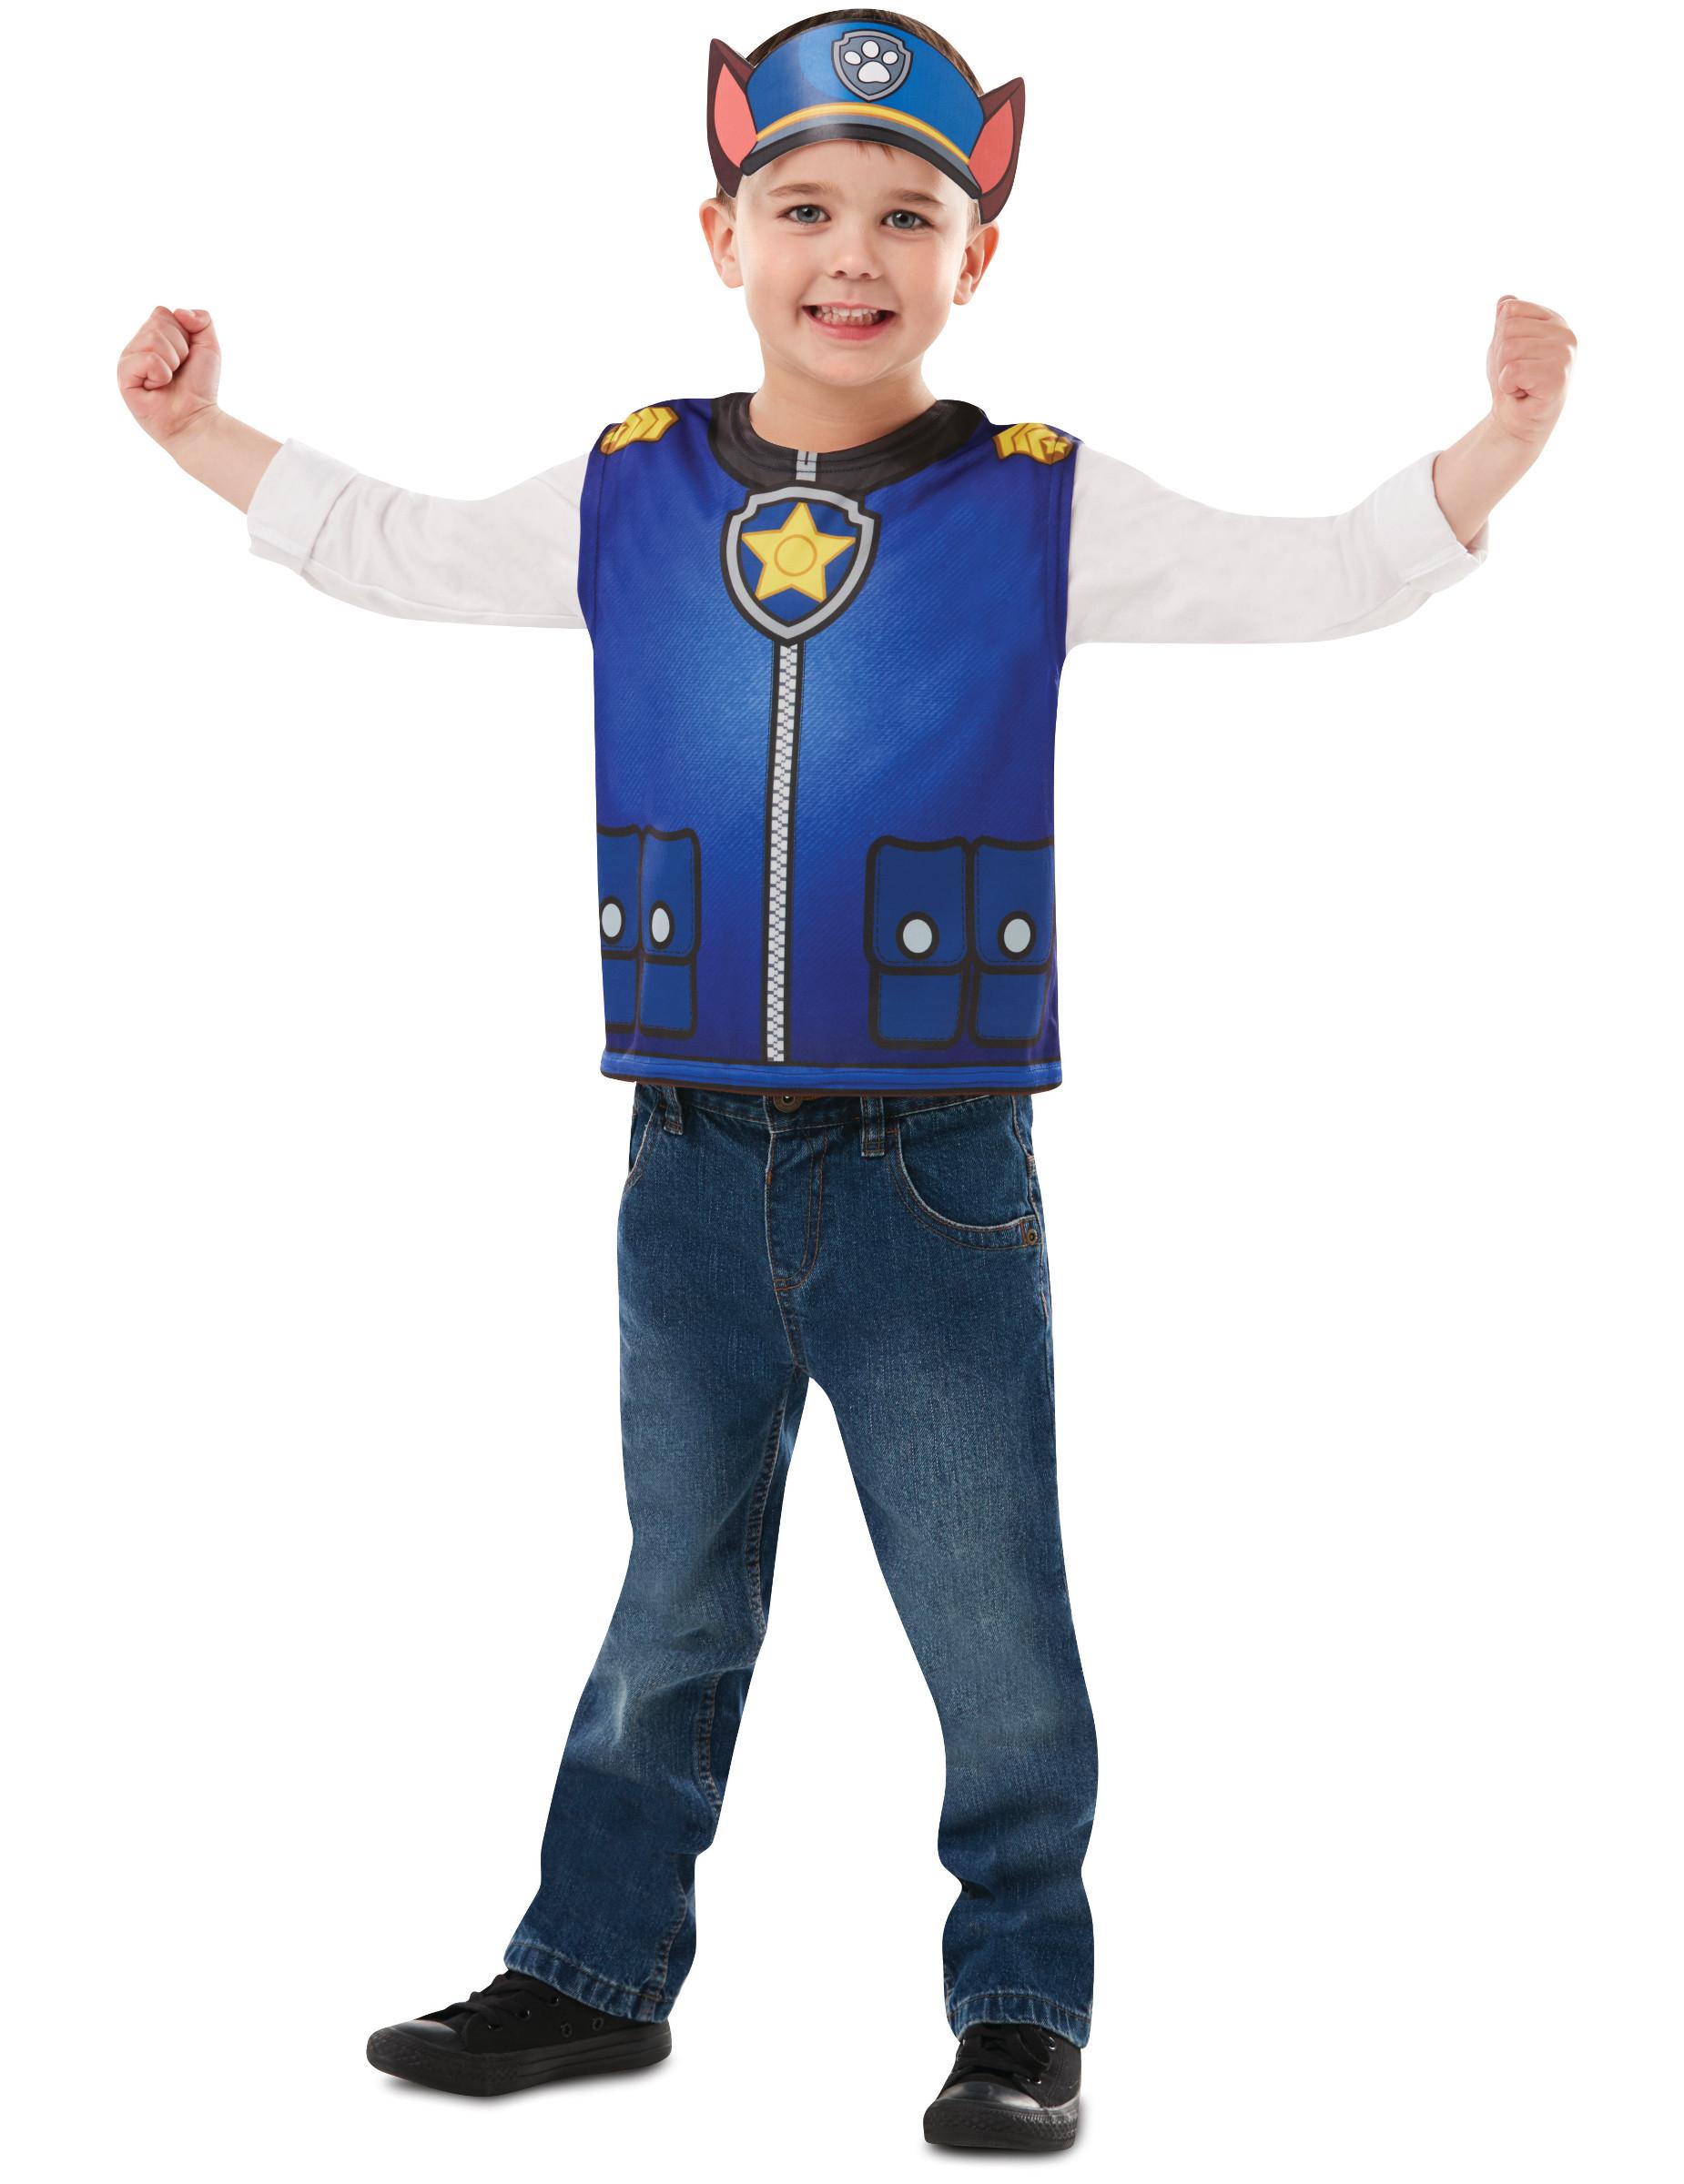 04ee45d23d33 Costumi in licenza ufficiale Paw Patrol™ per bambini - Vegaoo.it